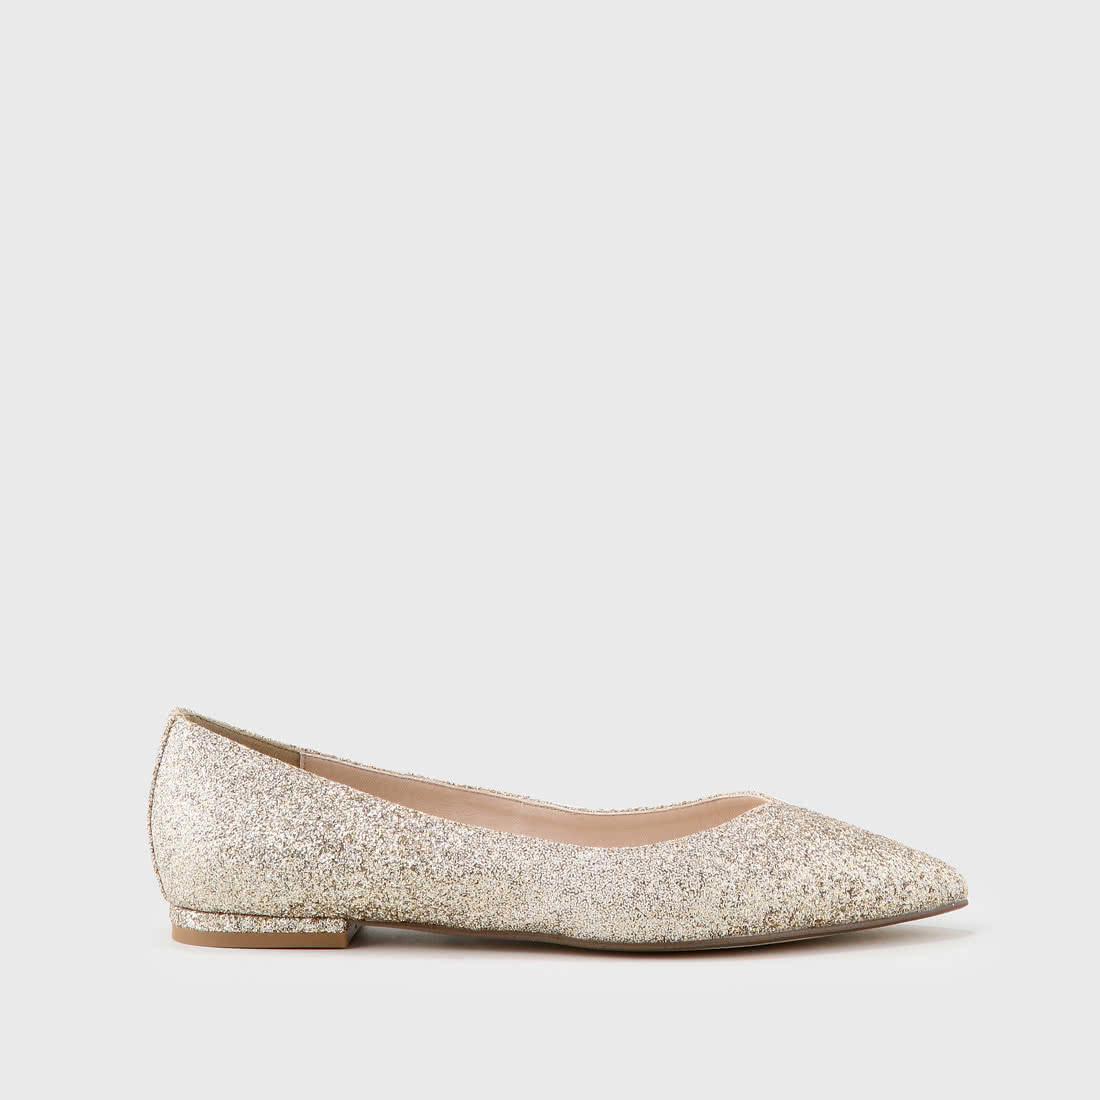 Shop Ballet Buy Glitter Flat Amireh Gold Buffalo In Online UGSLpqMVz